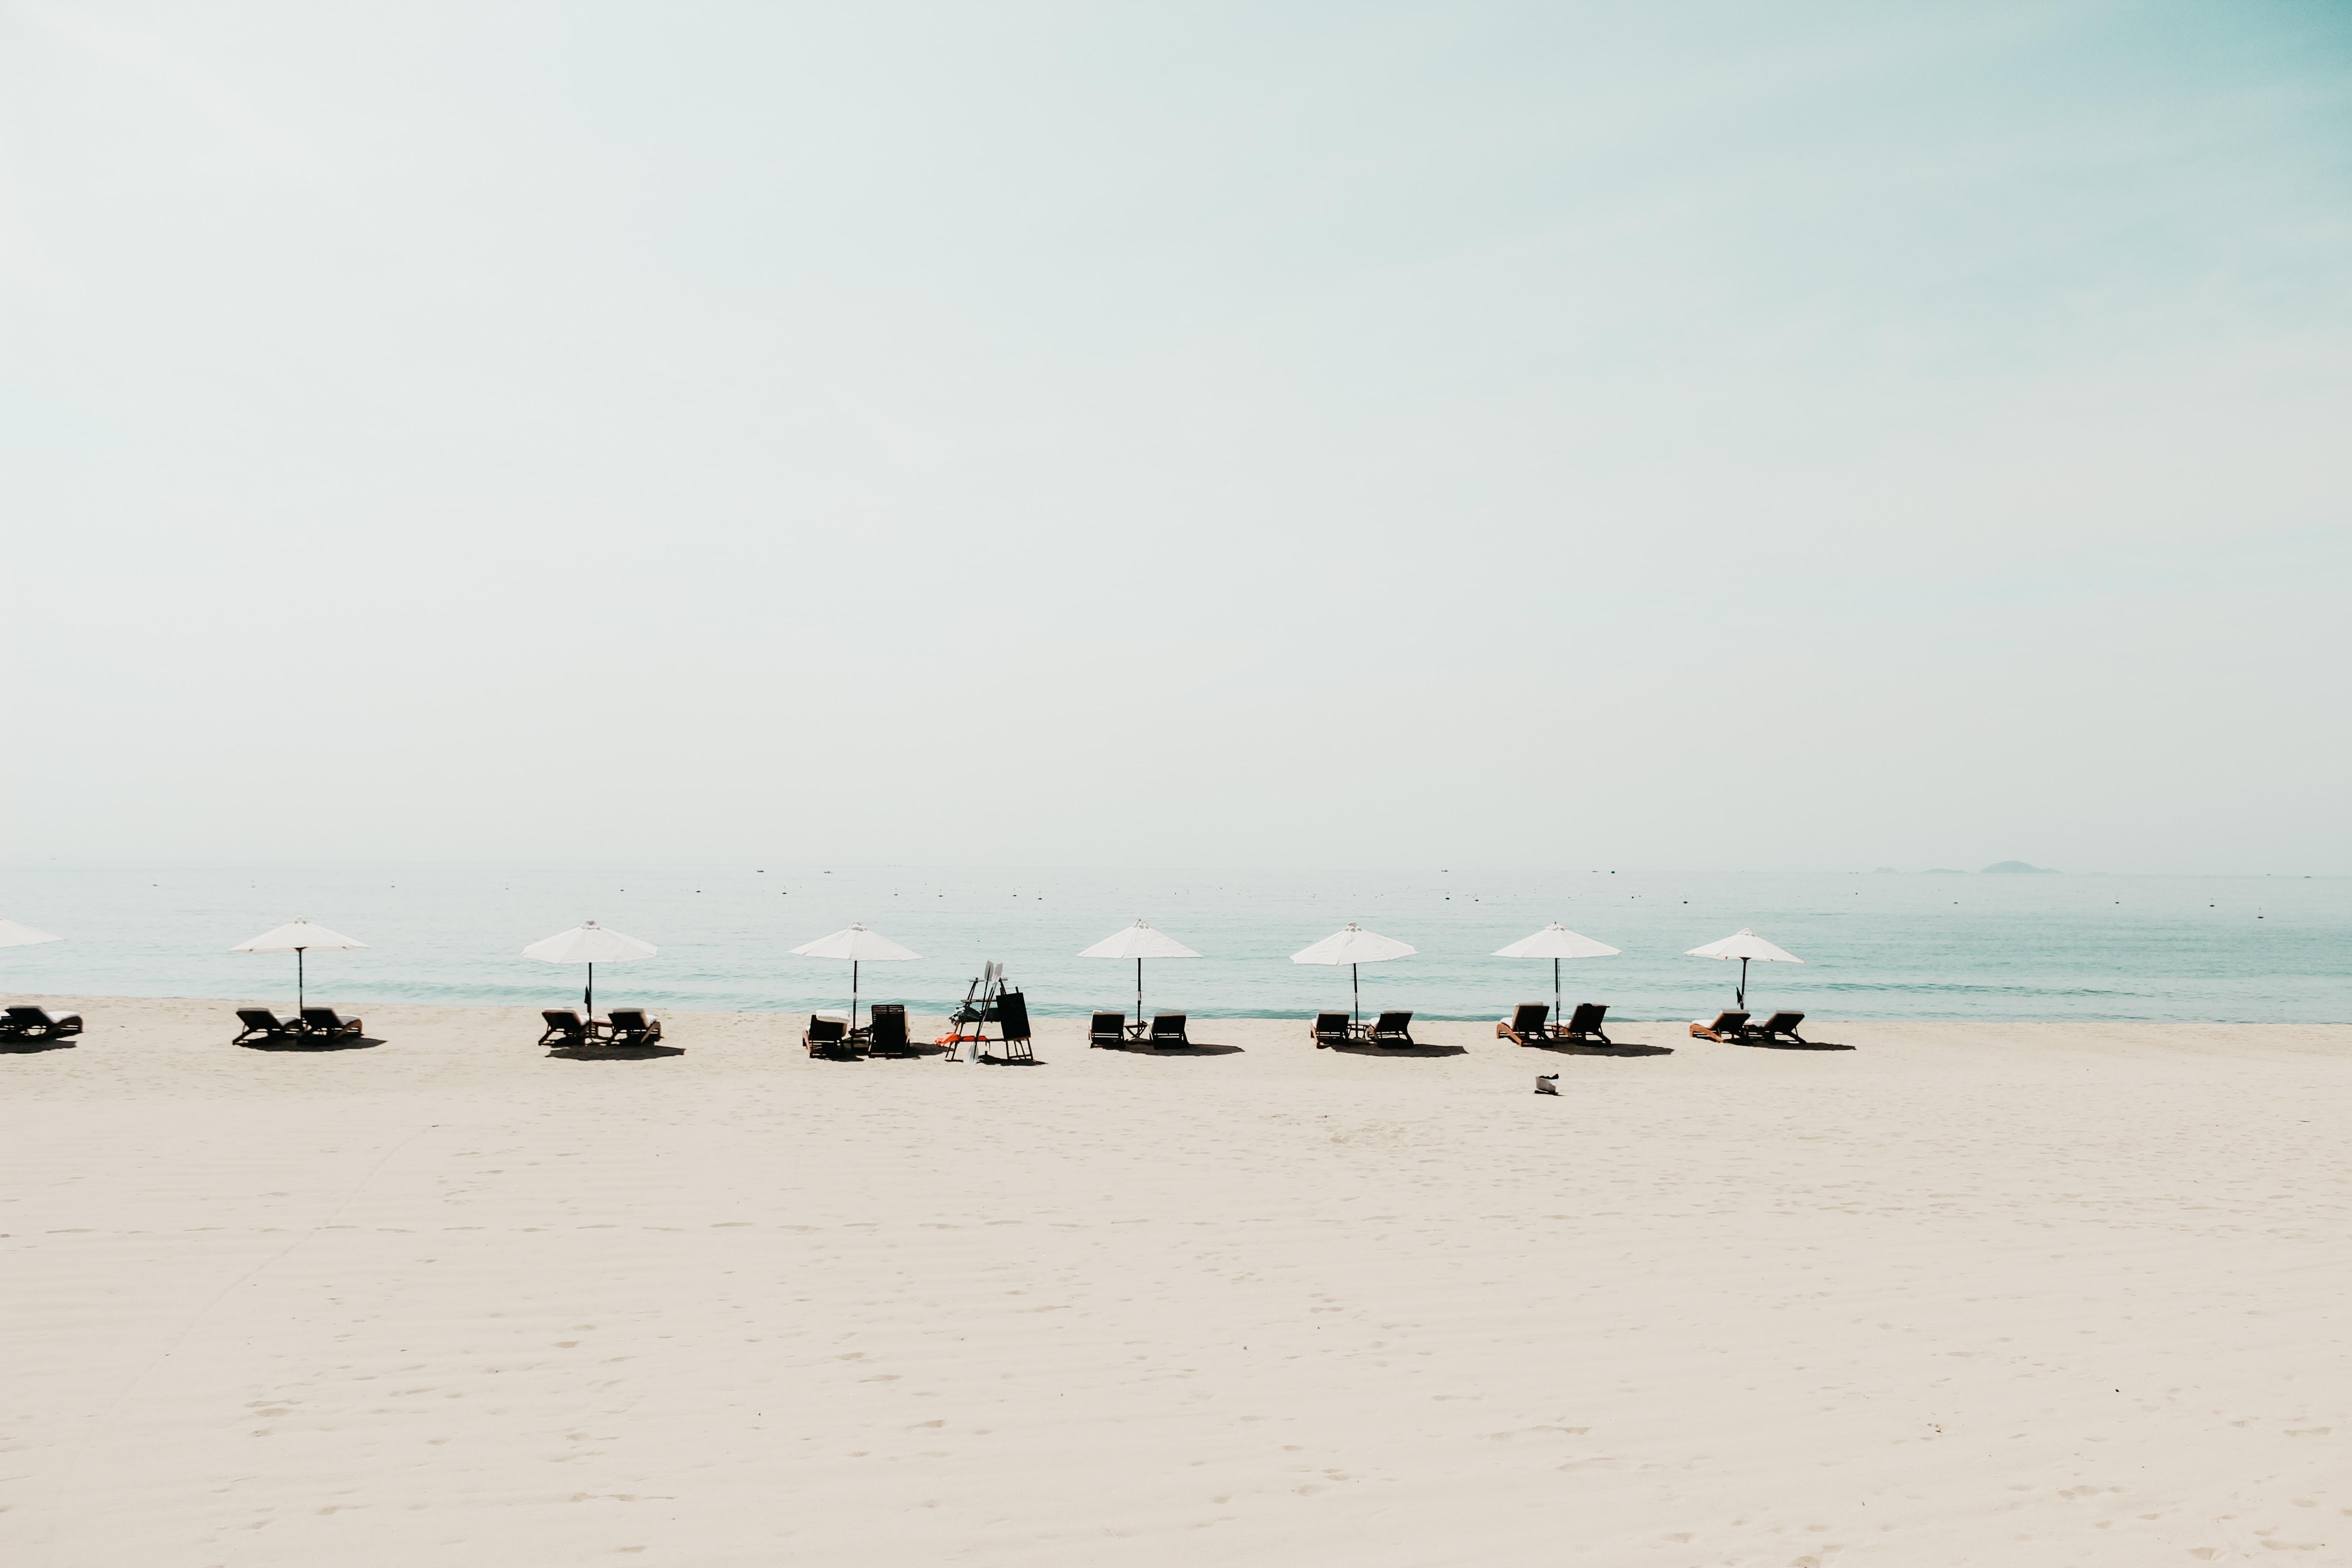 landscape shot of beach